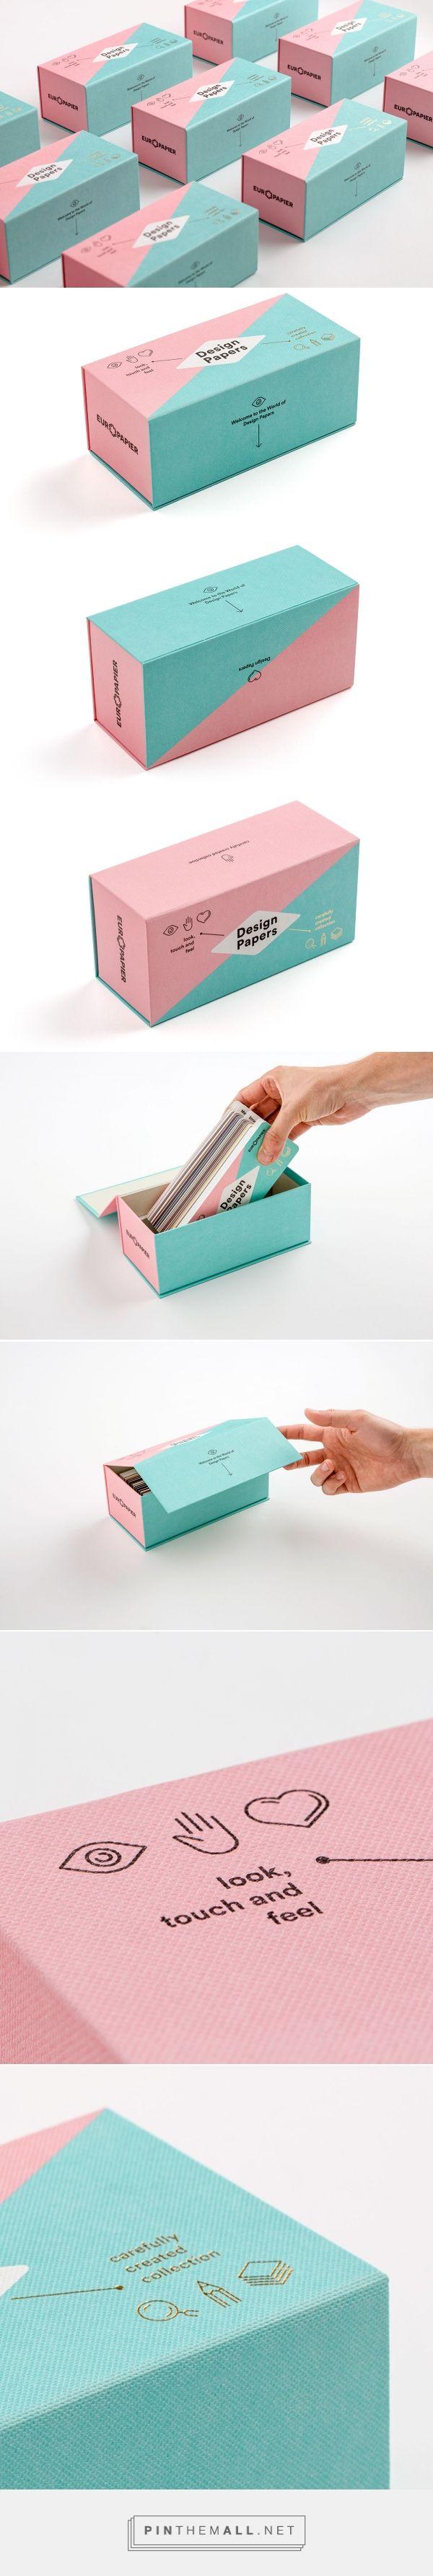 Design Papers 2016 / paper catalogue / by Metaklinika design studio